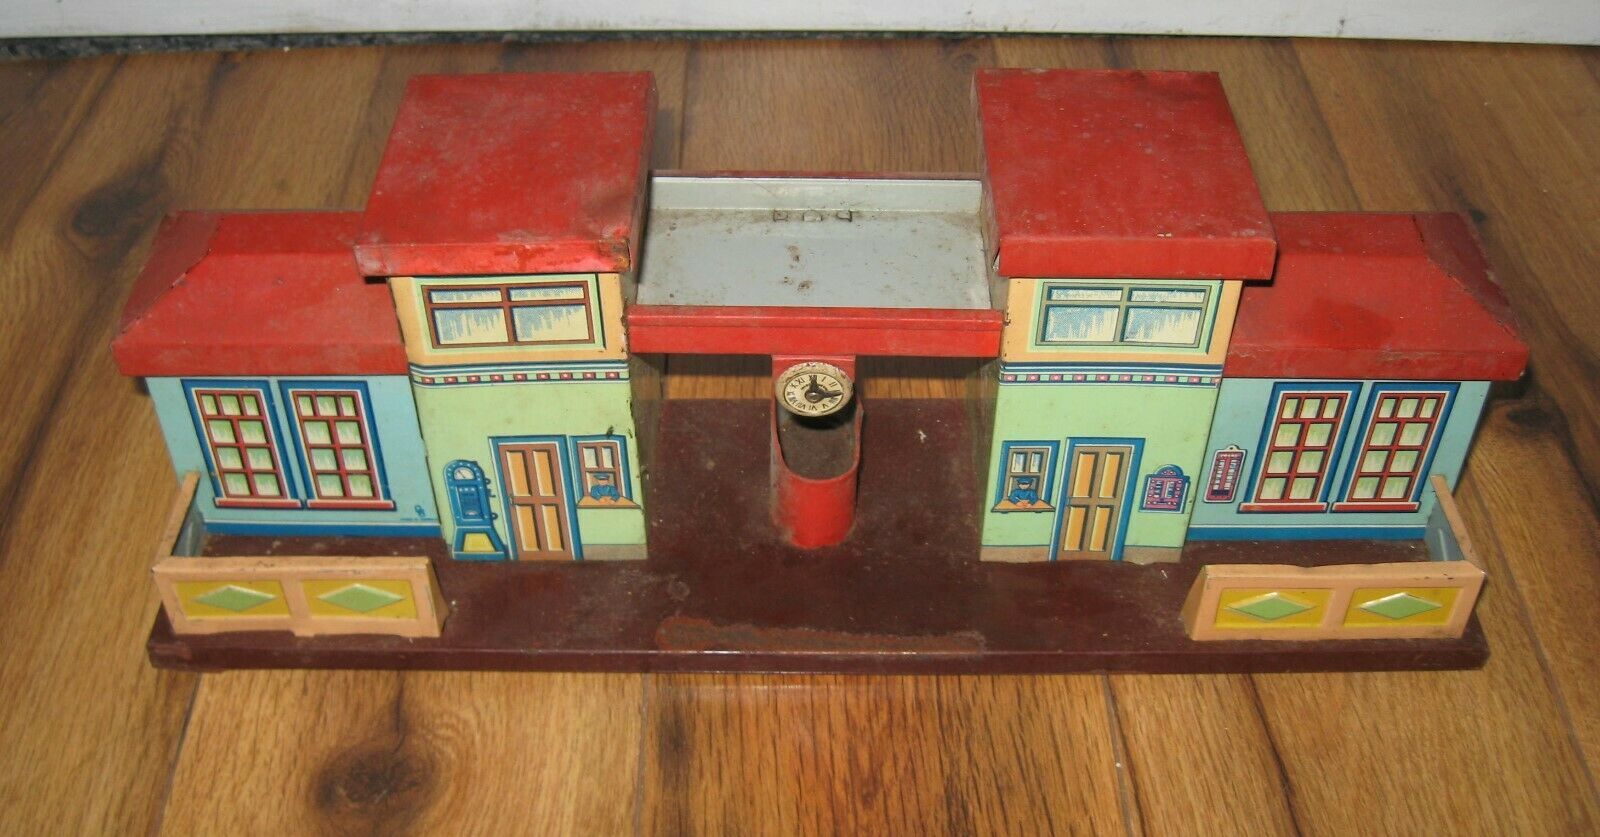 Estación Baker Bub, Bub, Bub, casiterita alemana, antigüedades raras, Vtg Bing kb marklin. 6ae